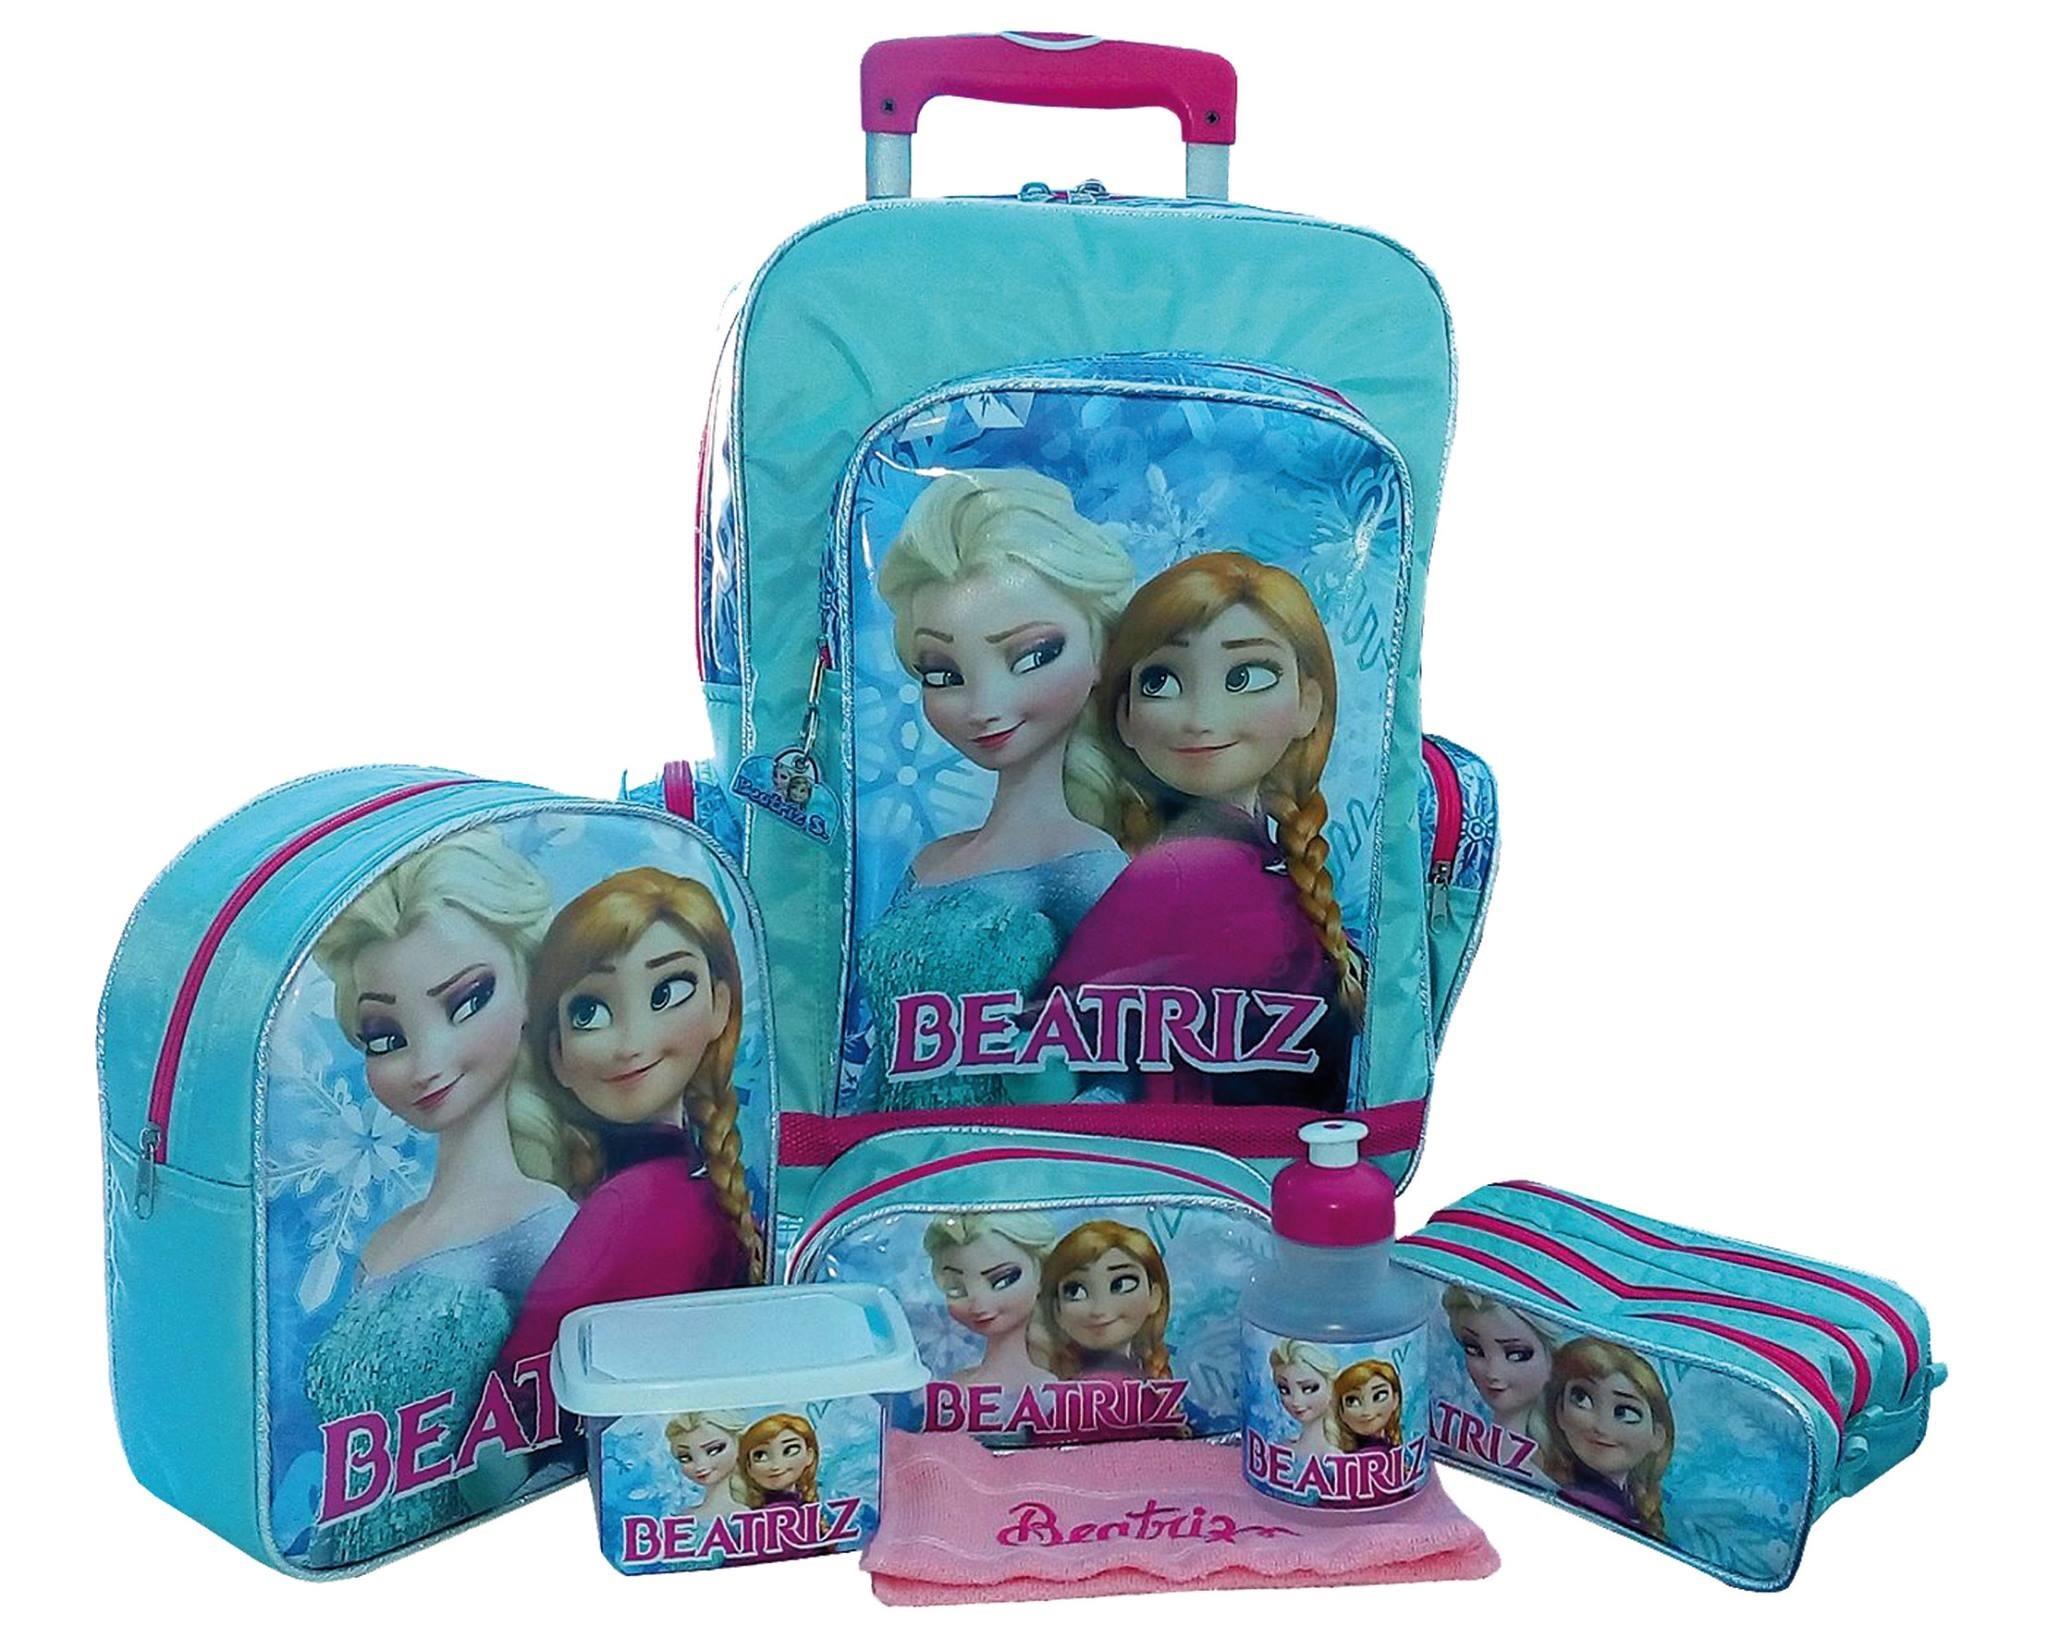 814063dfb Mochila Escolar Personalizada Frozen 05 pçs no Elo7 | Jujubalândia  Personalizados (85350C)